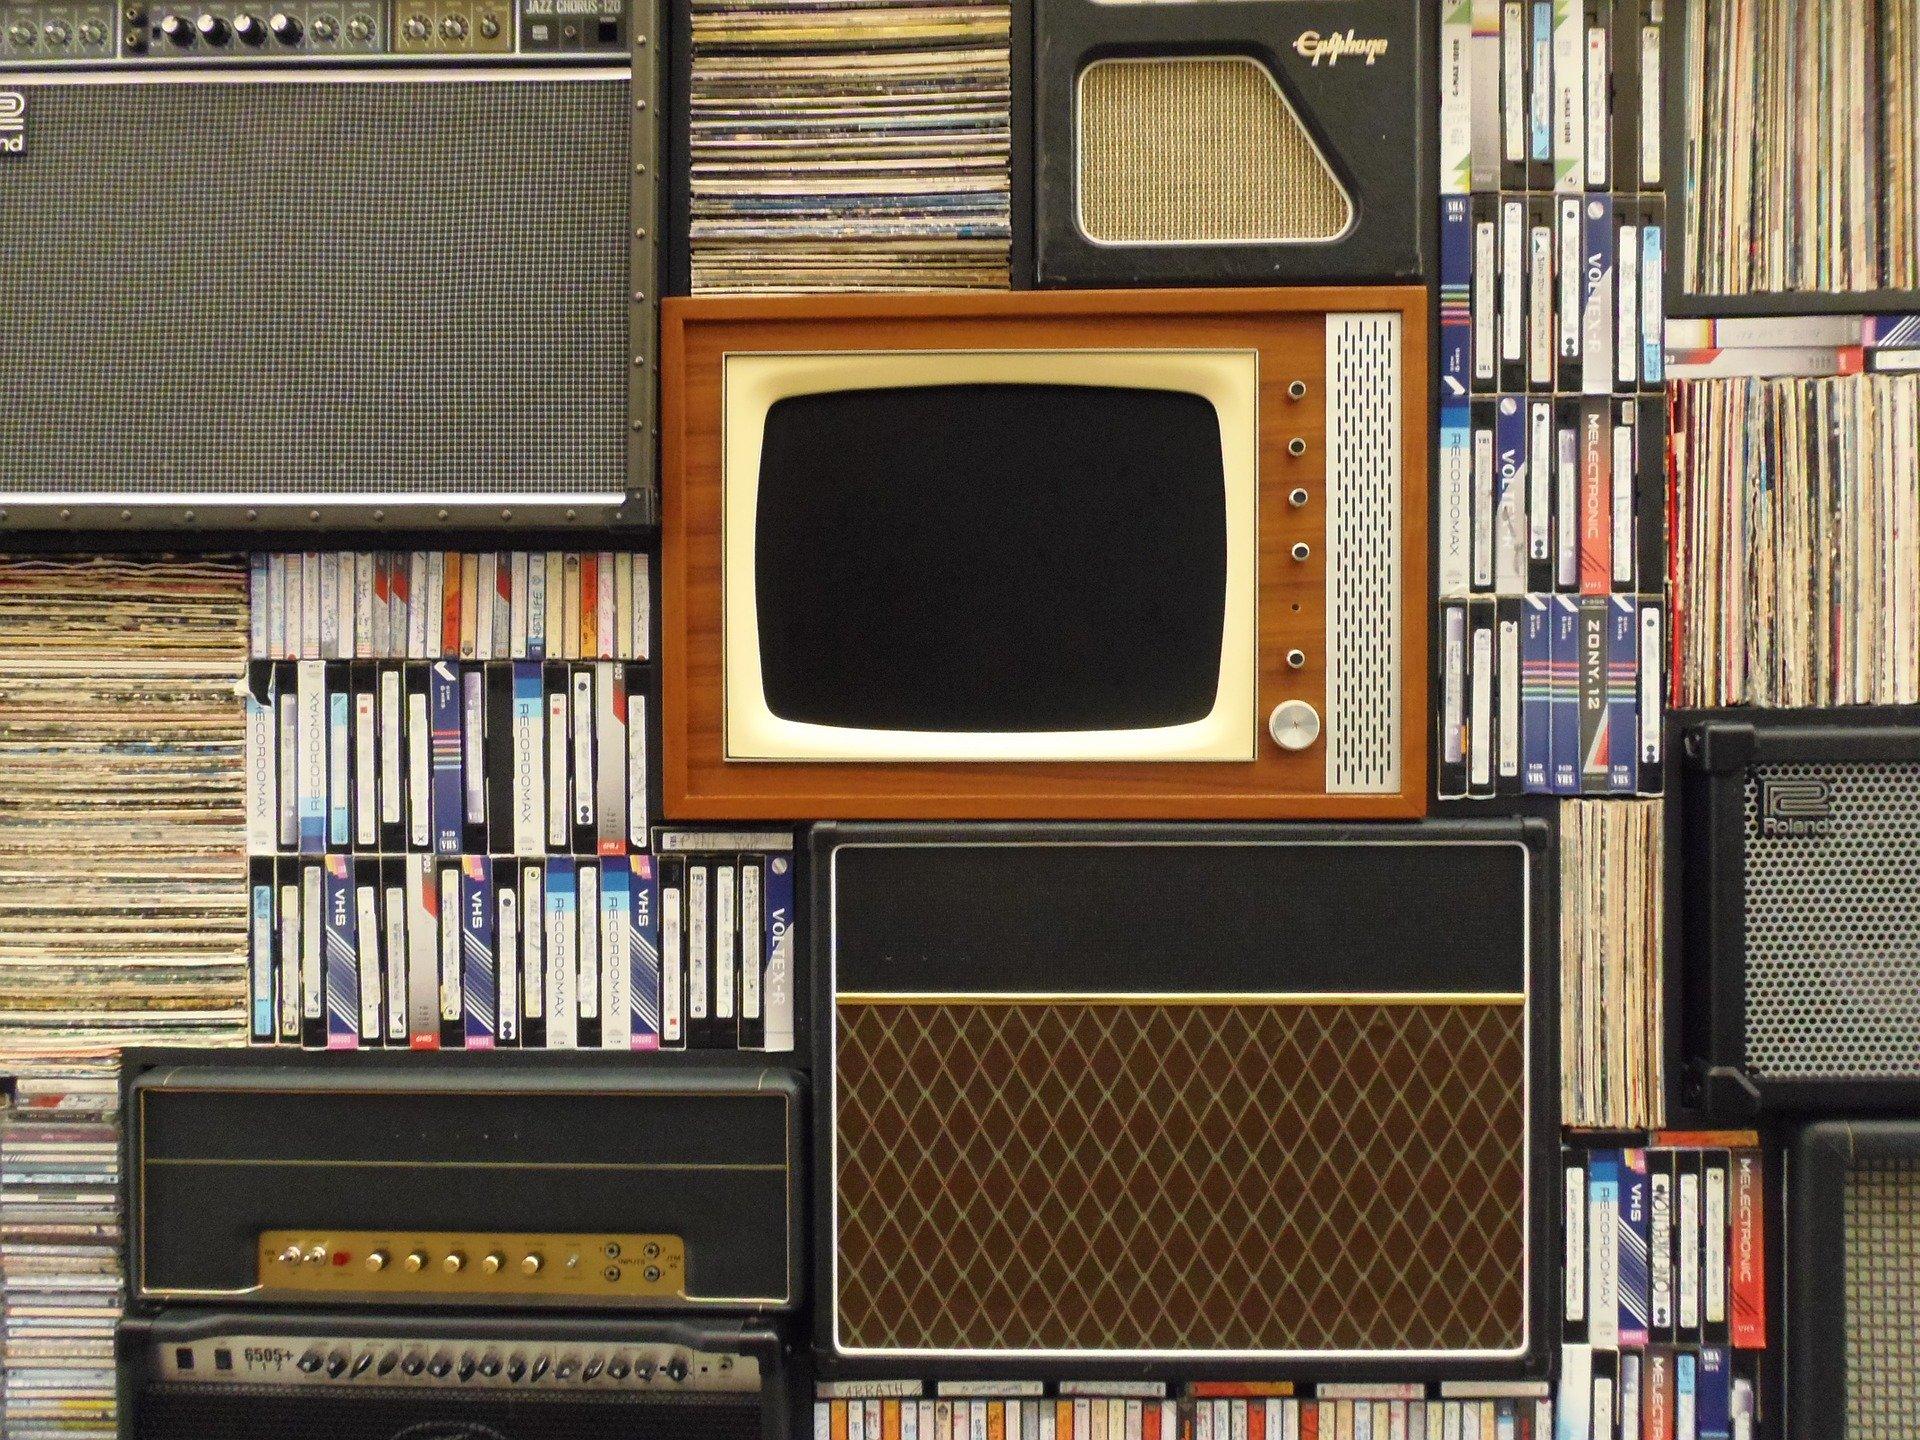 old tv_vhs